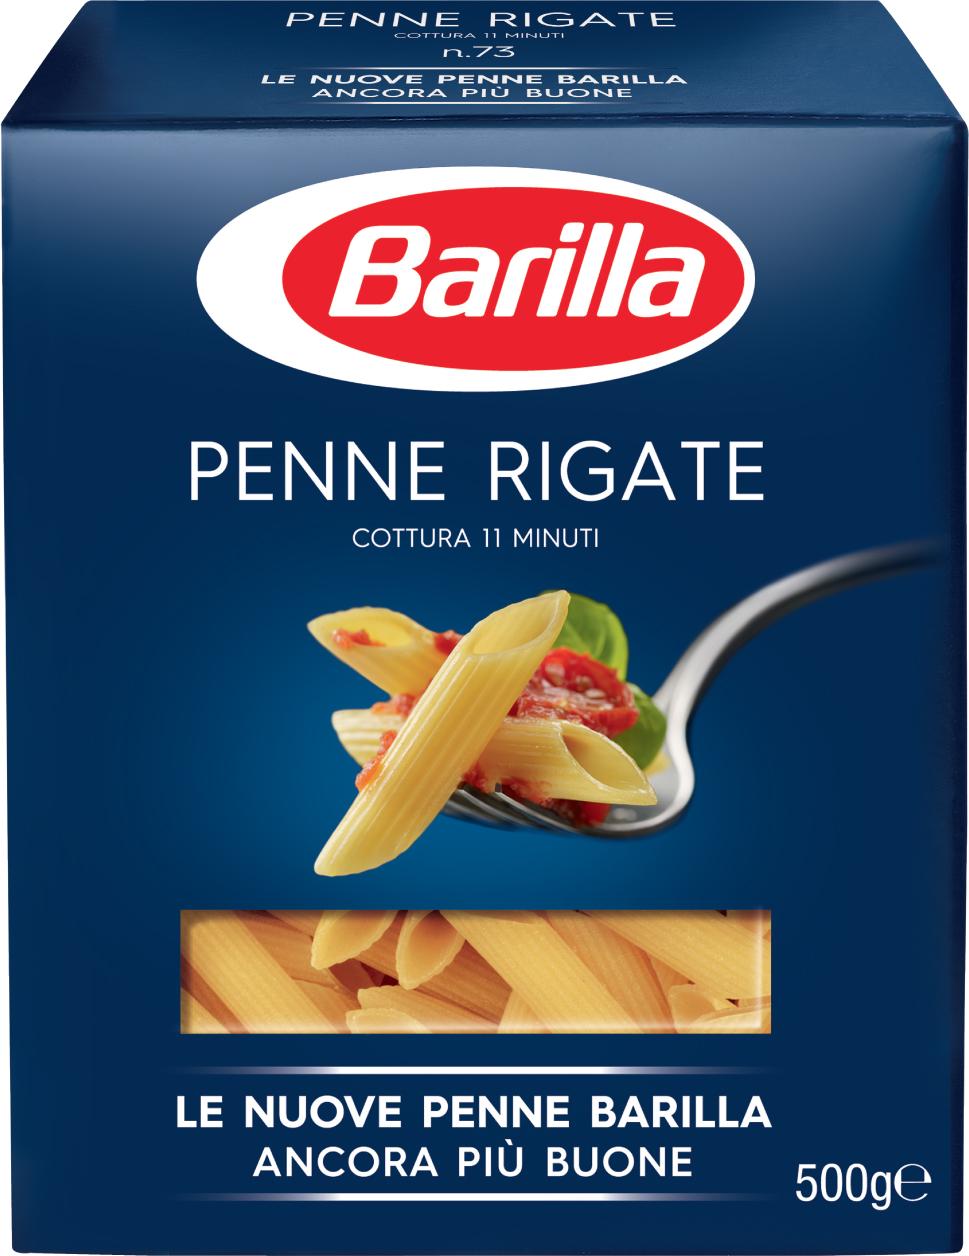 Penne rigate N°73 Barilla